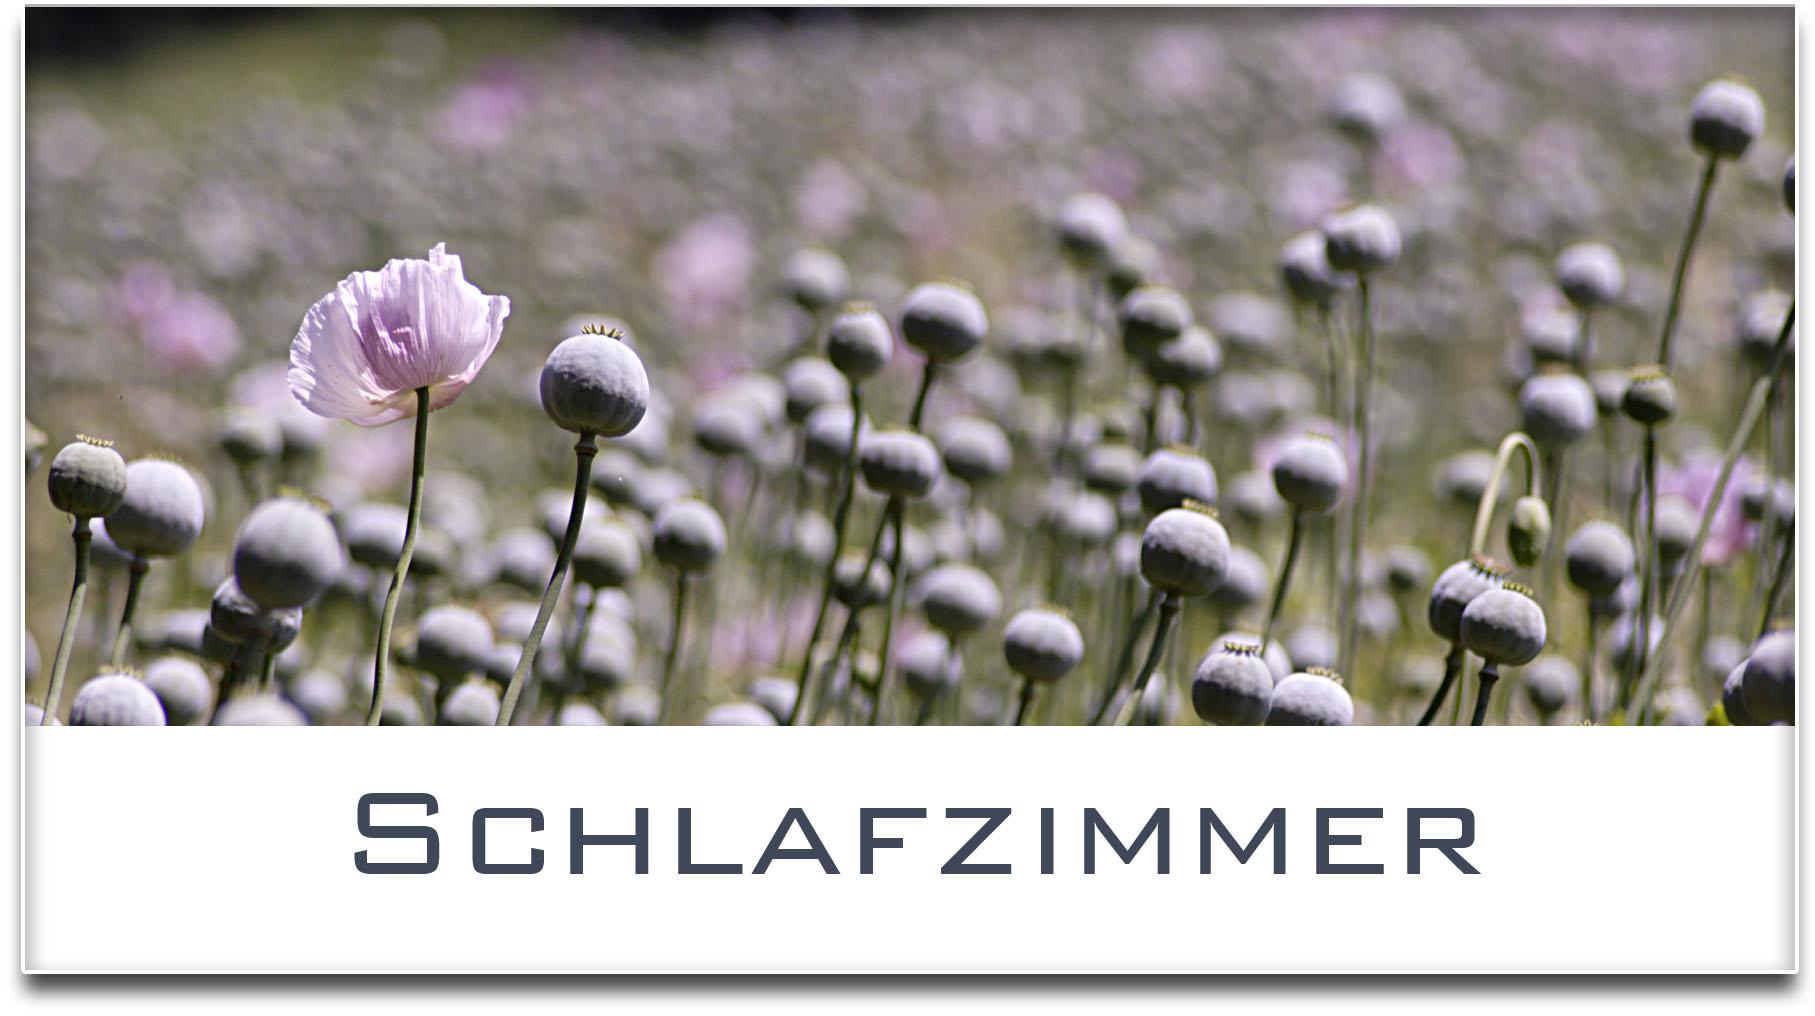 Türschild / Haustürschild / Mohnfeld / Schlafzimmer / Selbstklebend